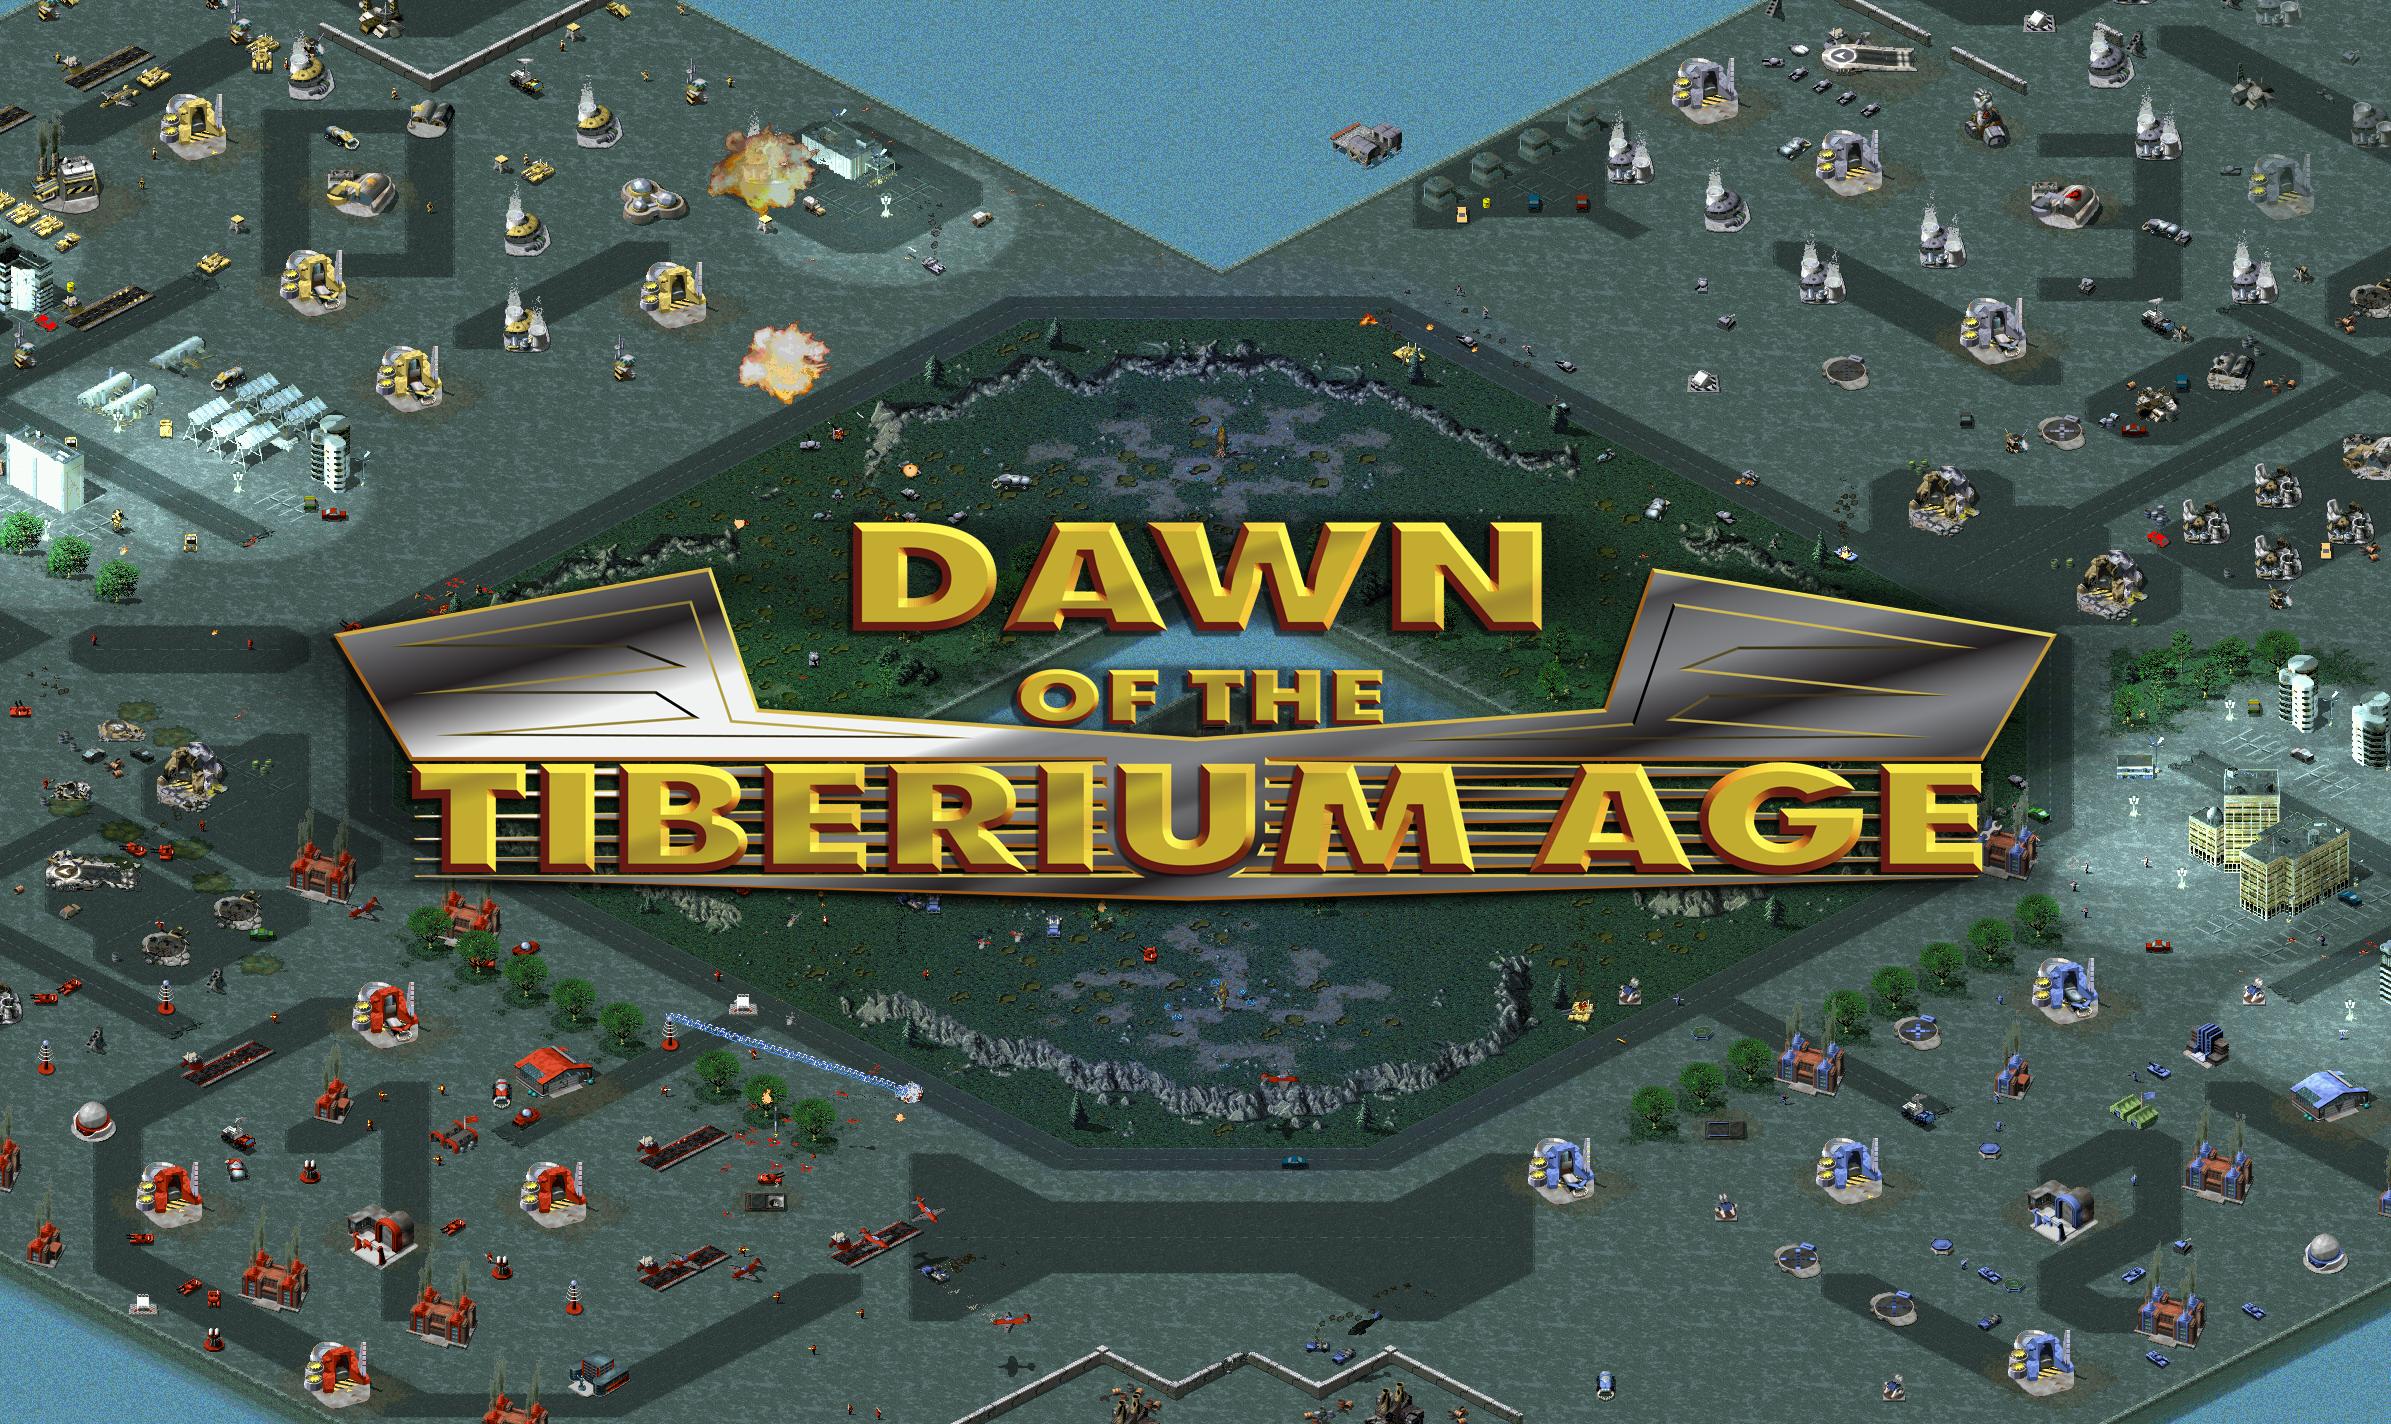 Screenshot with logo